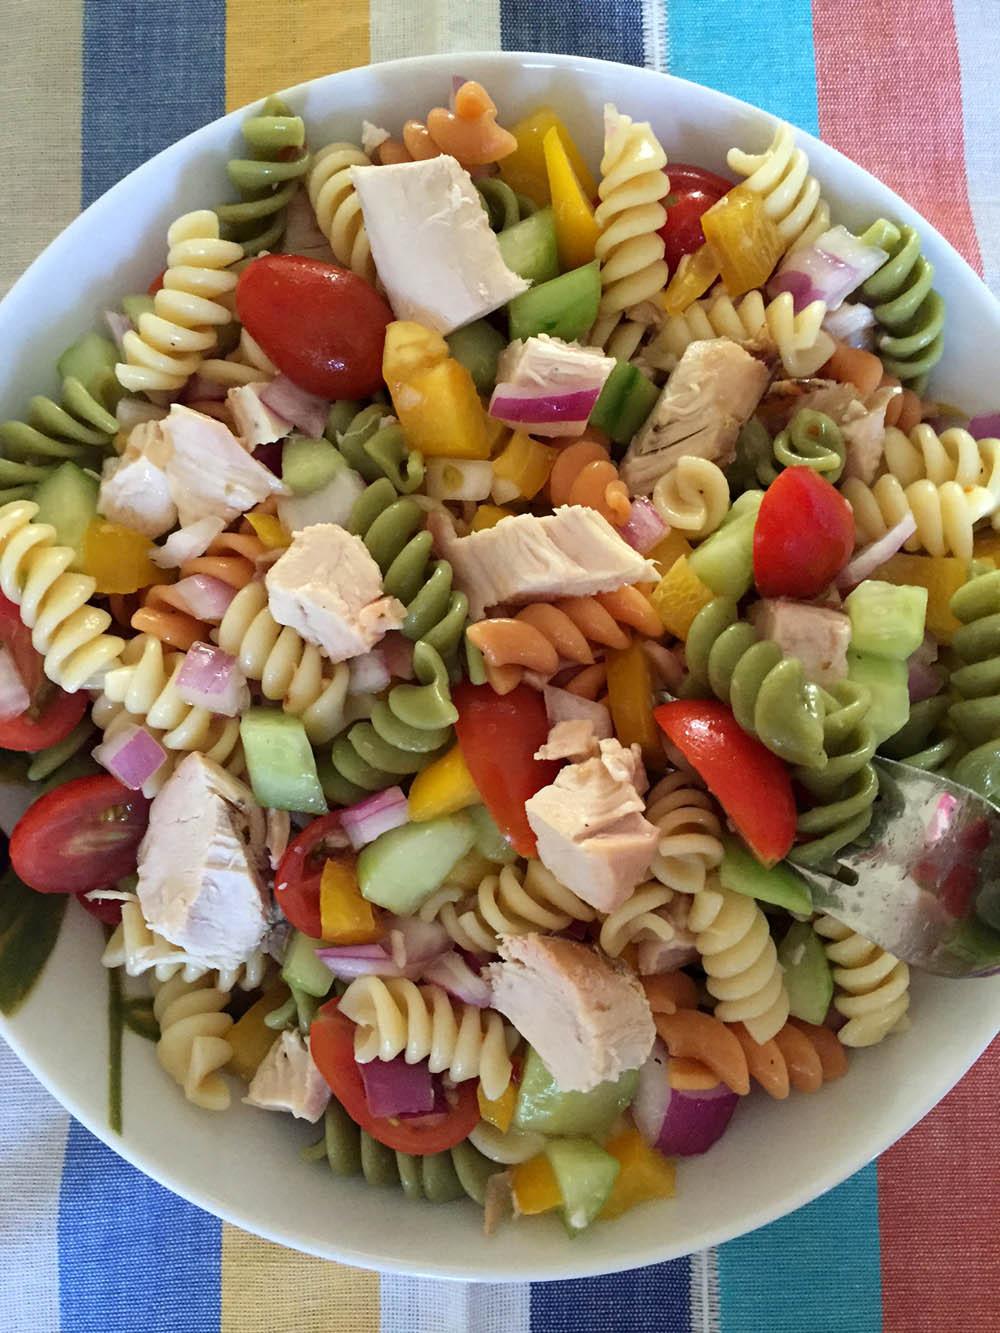 Healthy Chicken Pasta Salad  Easy Chicken Pasta Salad – Healthy Main Dish Pasta Salad